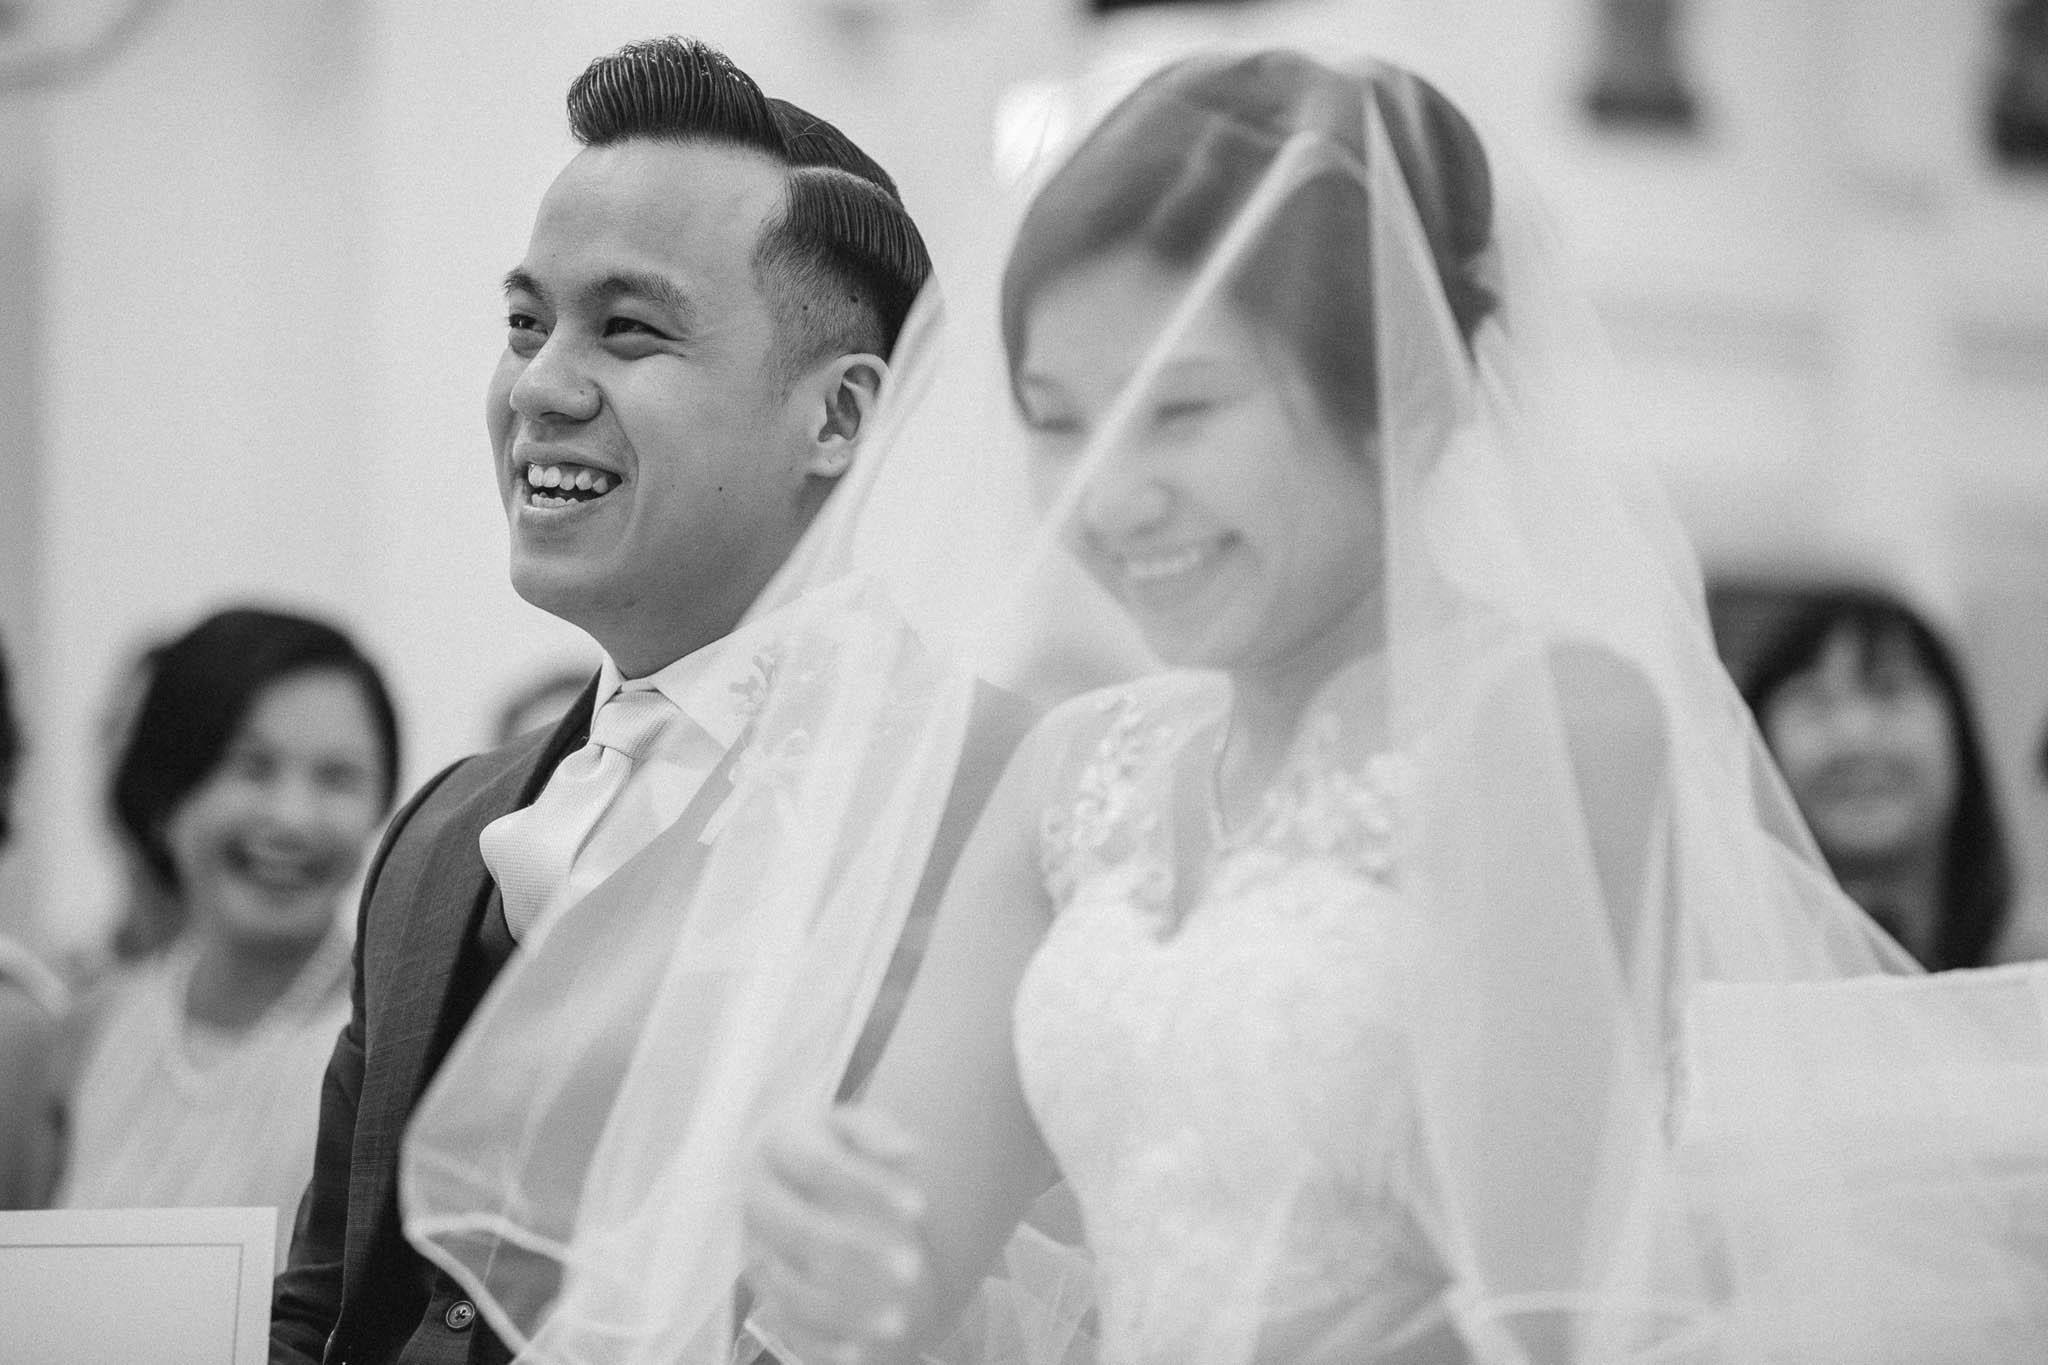 singapore-wedding-photographer-malay-indian-pre-wedding-travel-wmt-2015-jeremy-larissa-33.jpg